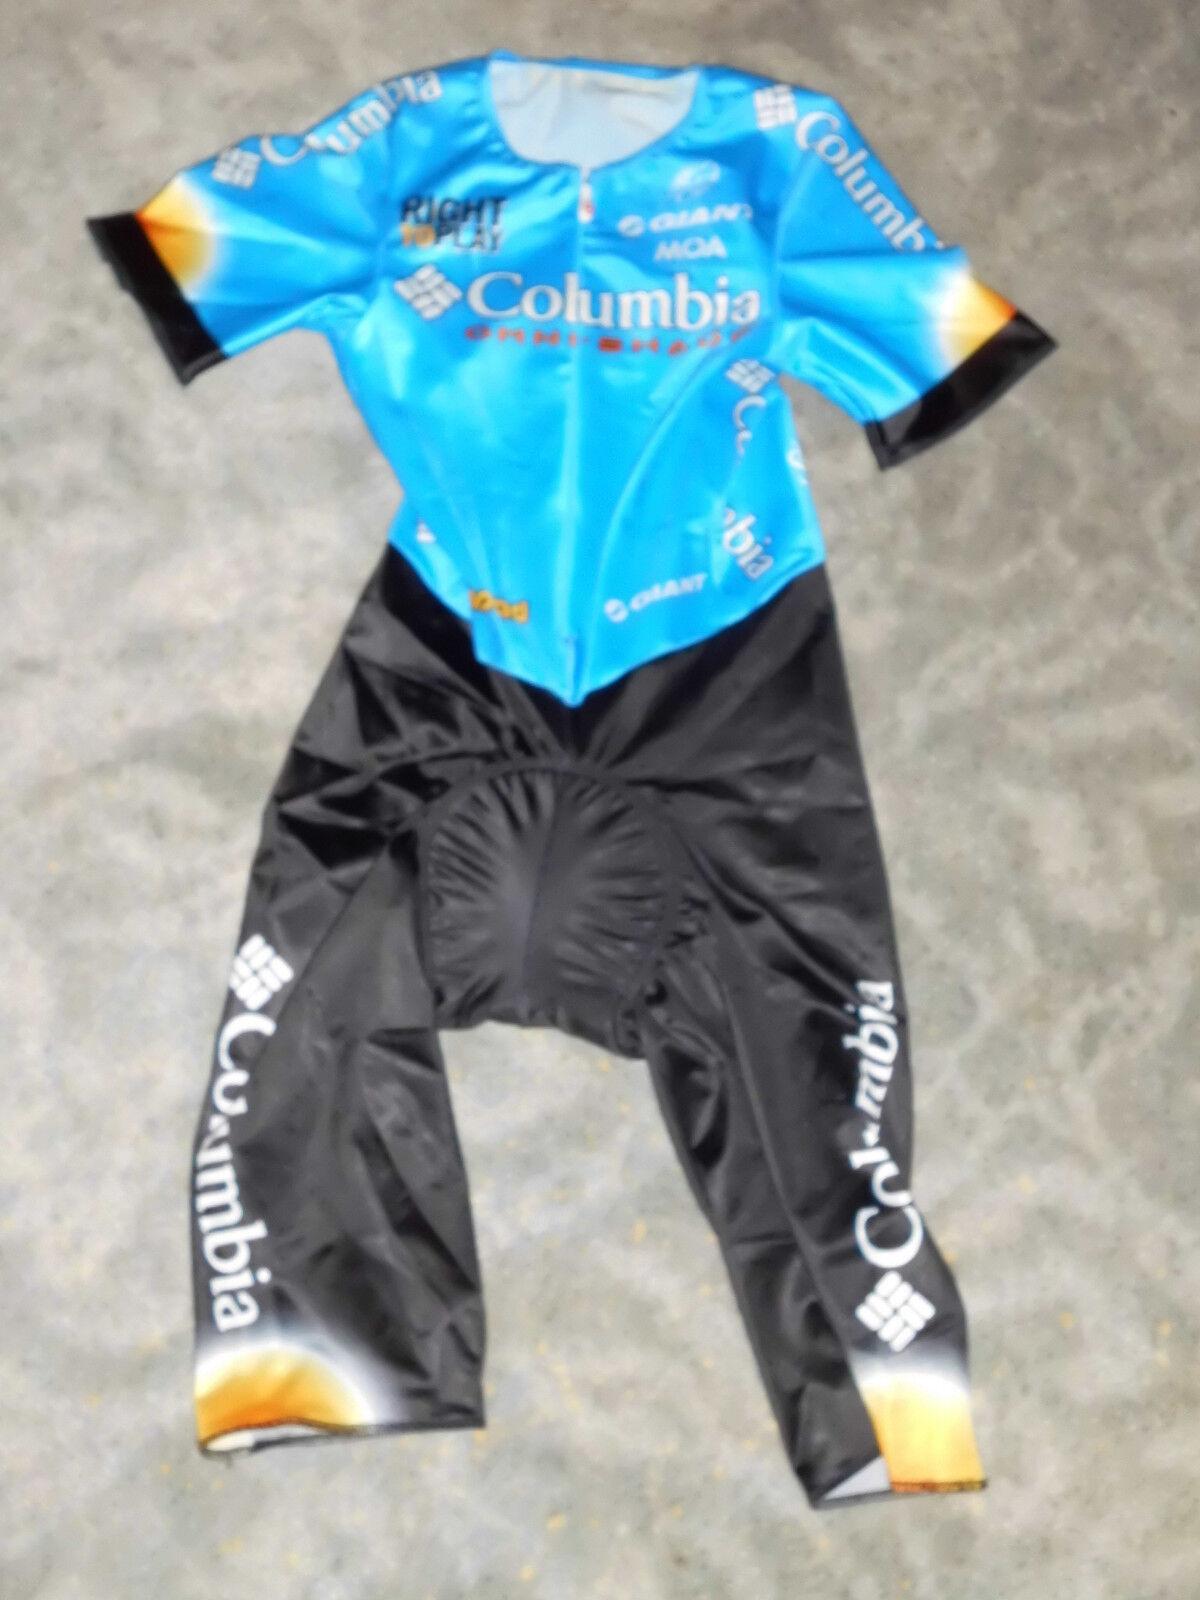 MOA Team Columbia Highroad Giant Aero kurzarm Zeitfahranzug / Skinsuit